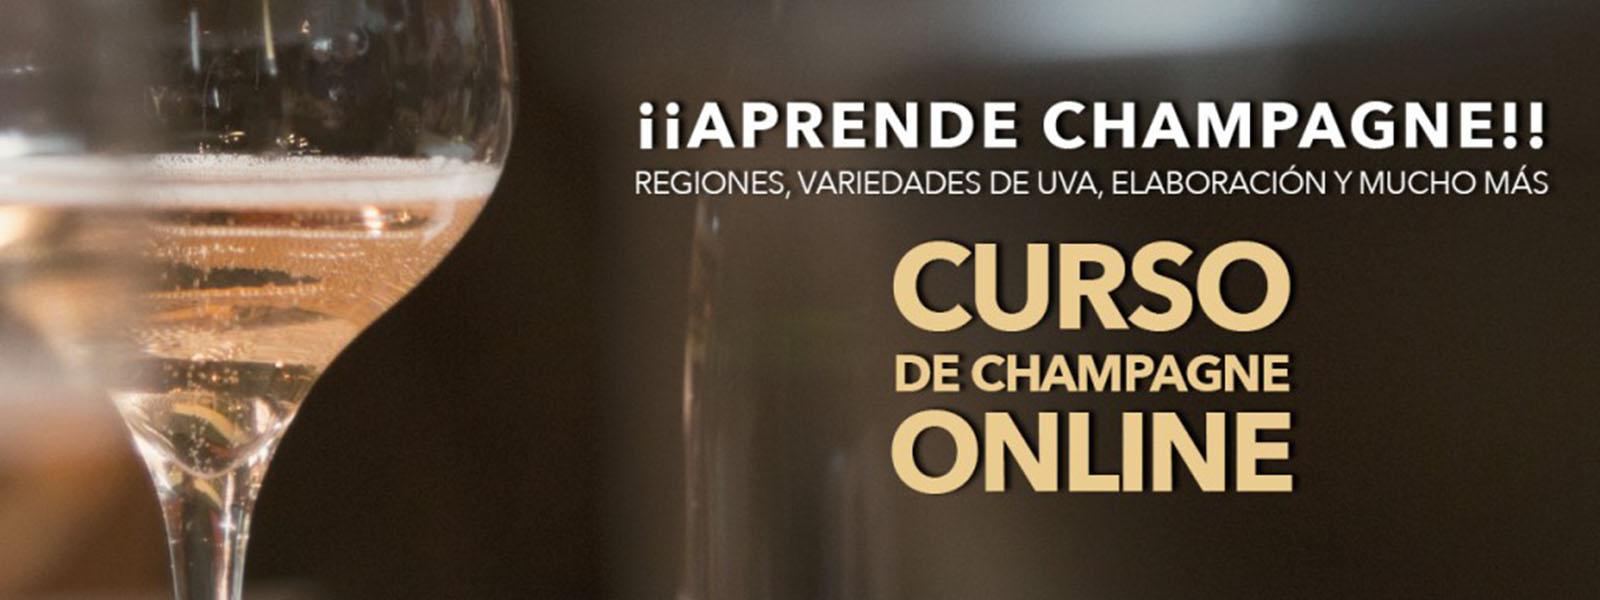 curso-champagne-online-v2